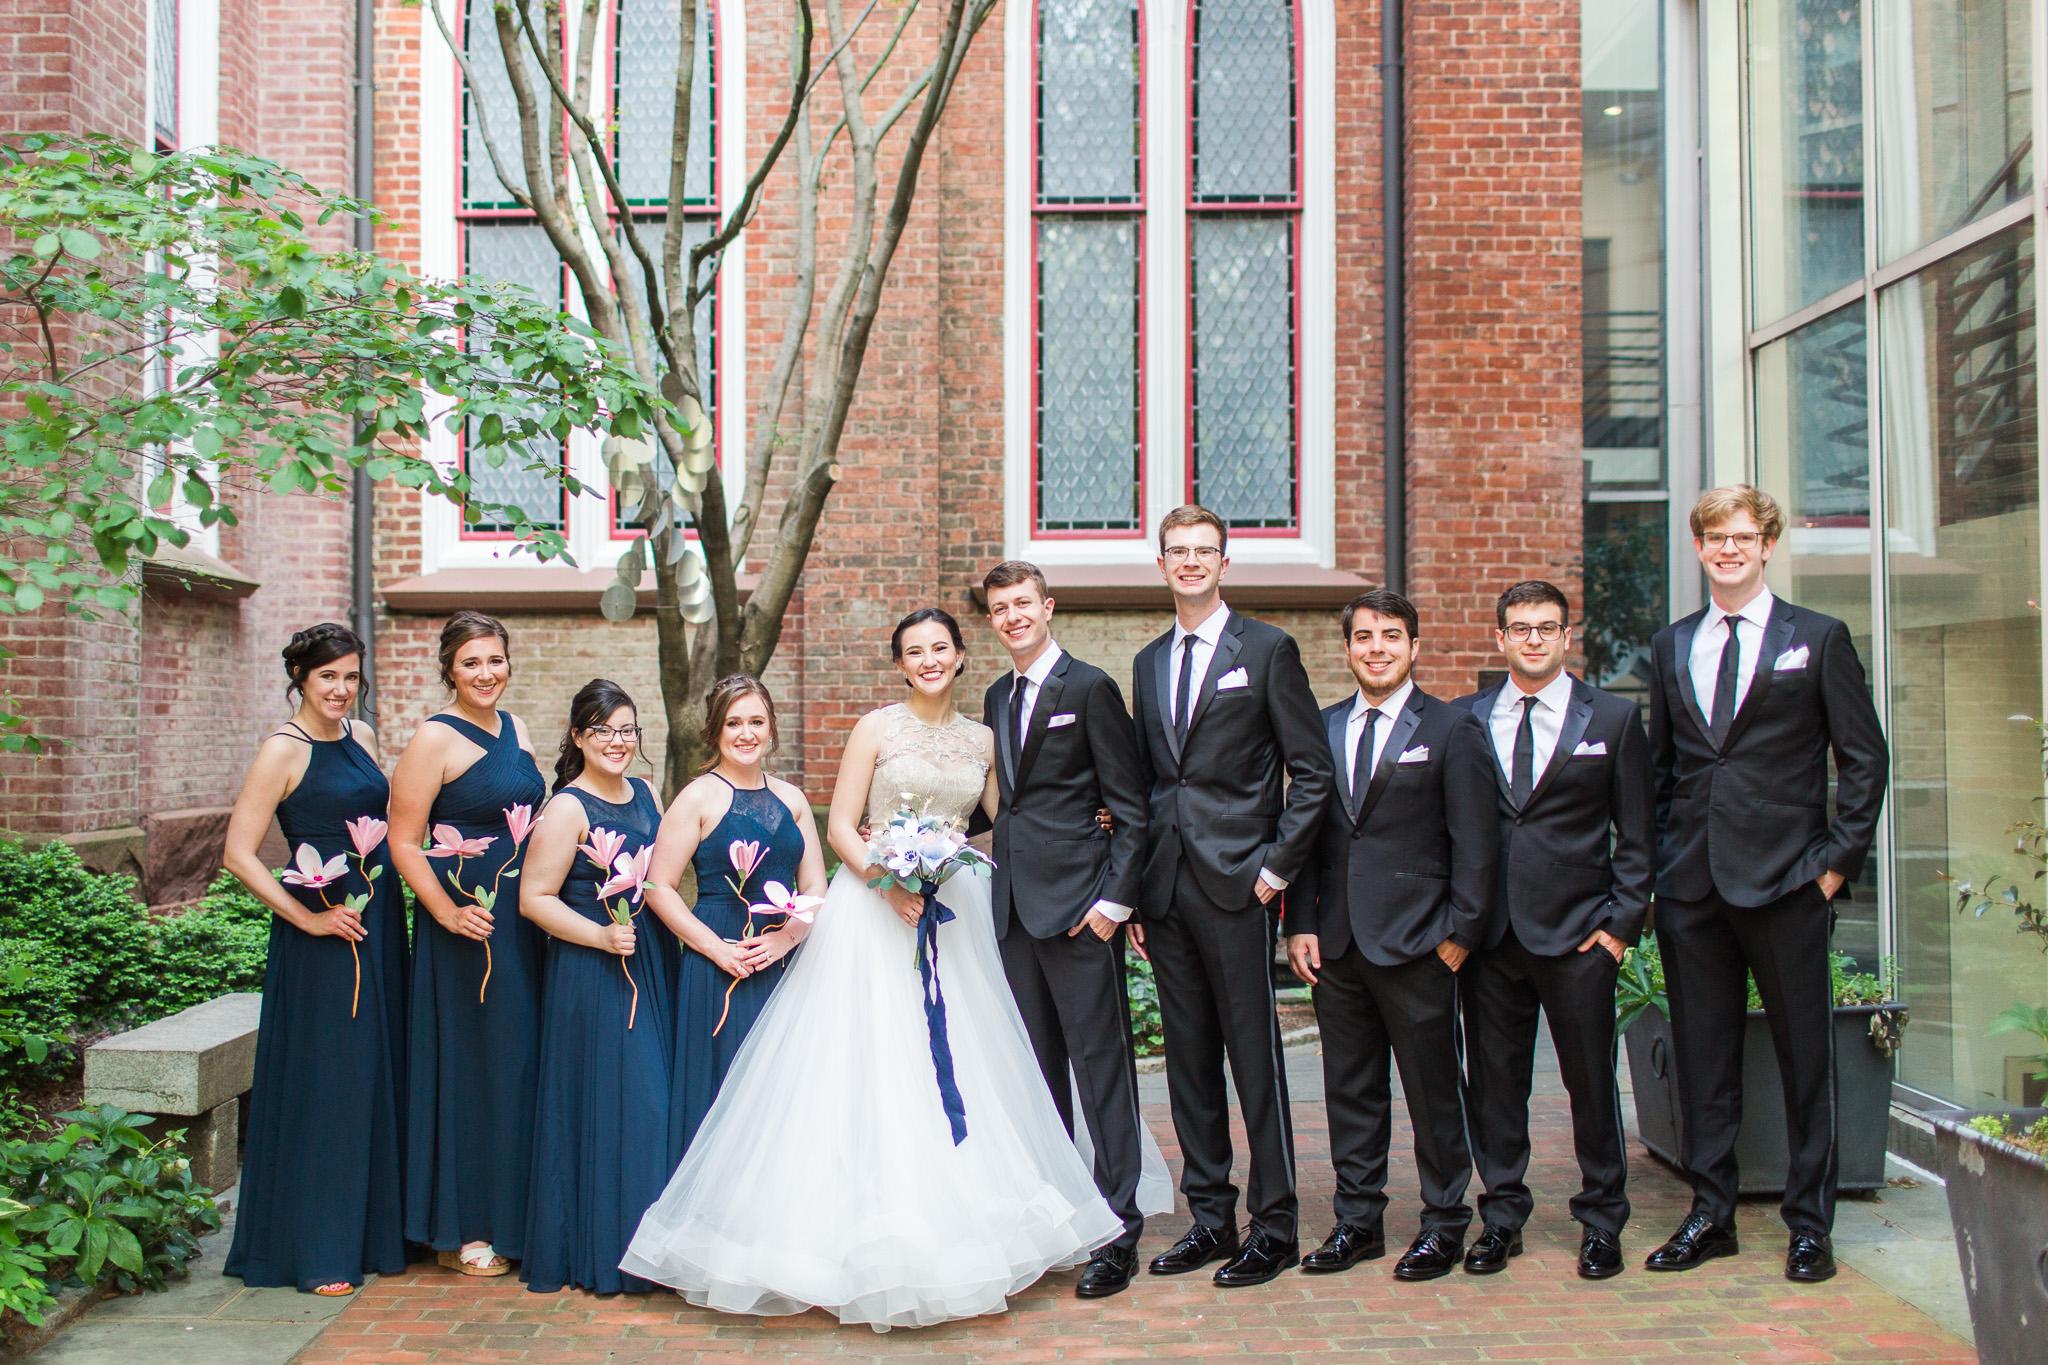 John Marshall Ballrooms Wedding in Richmond, VA || Lynchburg, Charlottesville, and Richmond Wedding Photographer || www.ashleyeiban.com